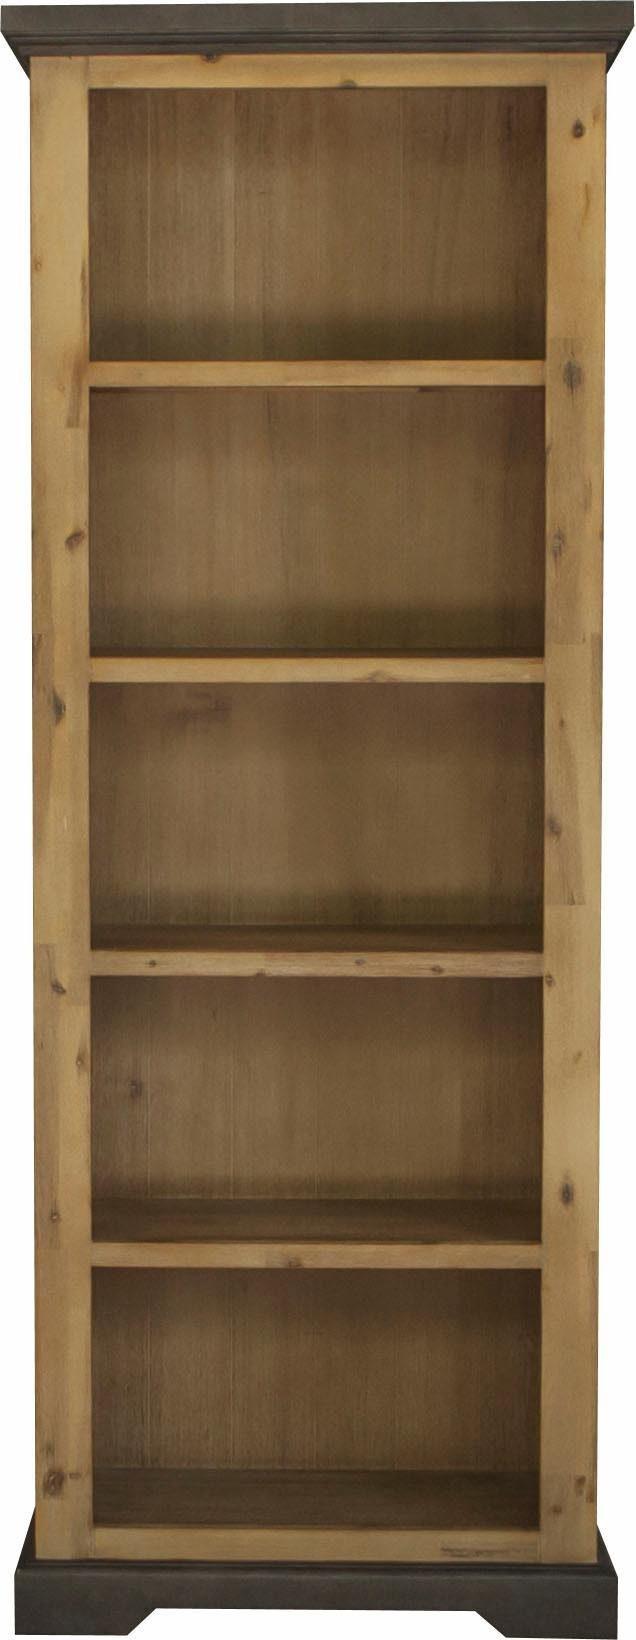 Quadrato Bücherregal »Panama«, aus gebürstetem Akazienholz in Betonopik, Breite 75 cm